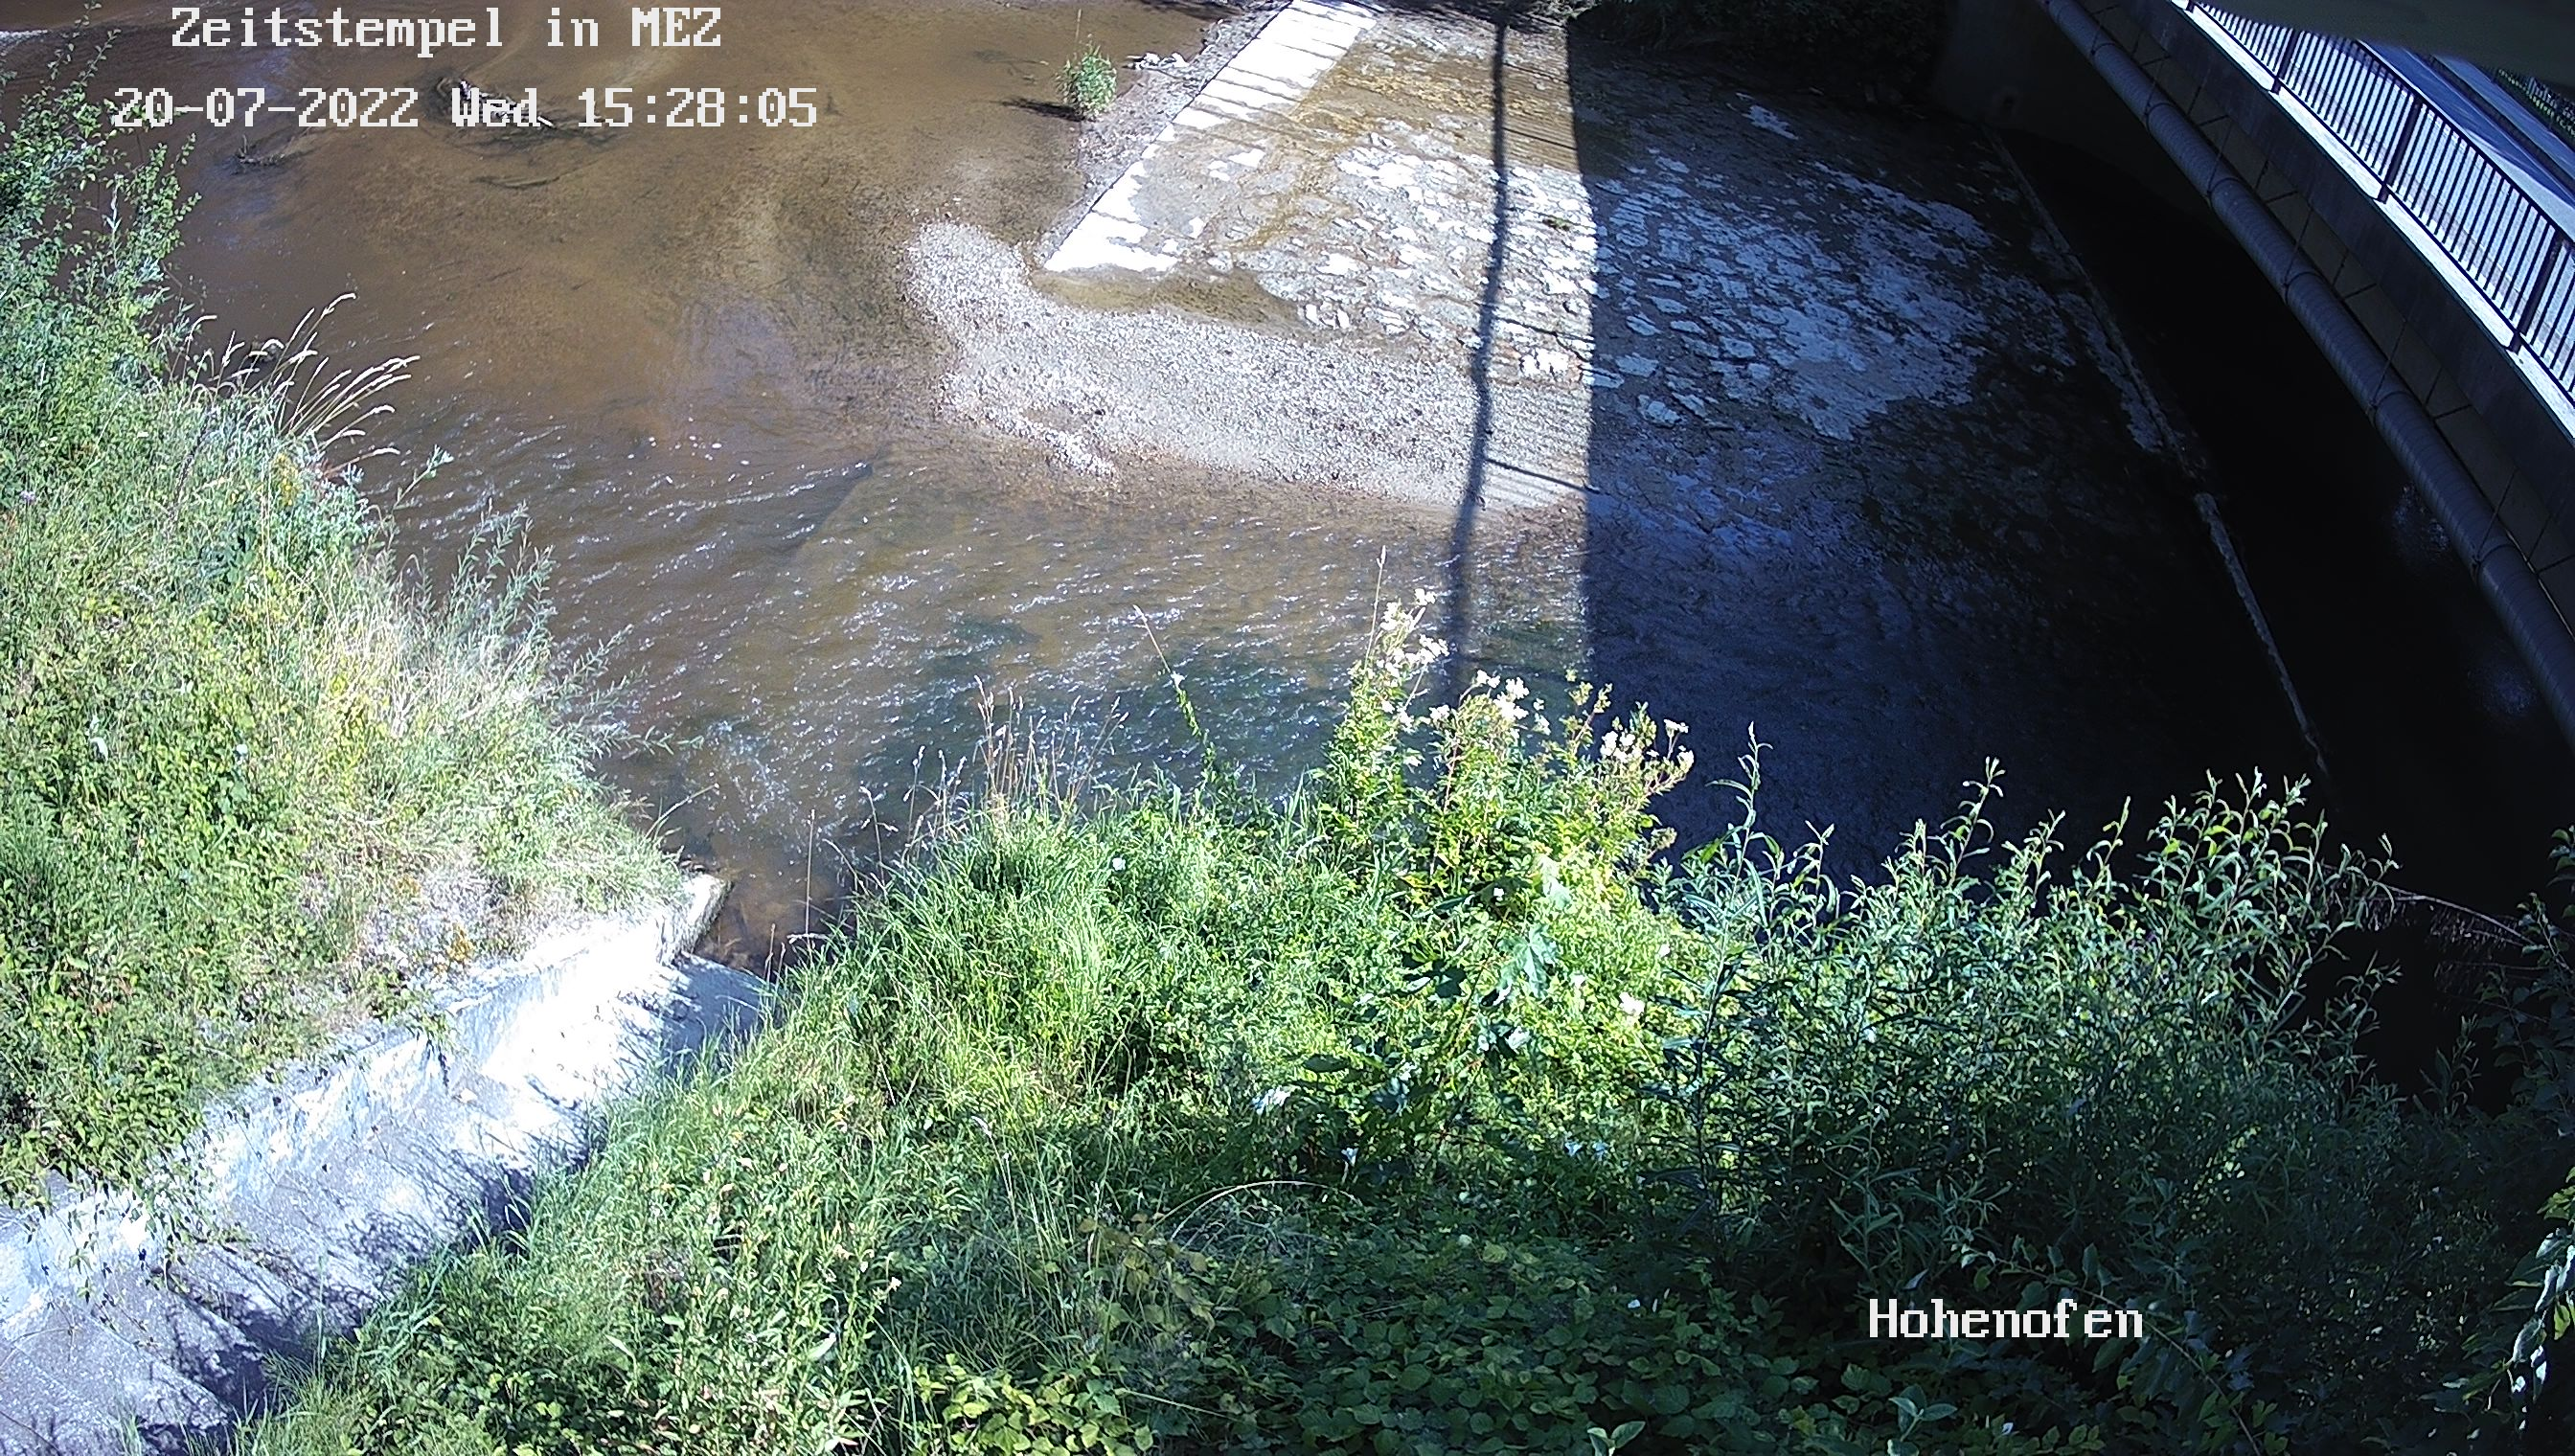 Aktuelles Webcambild Pegel Hohenofen-Kaltenbach